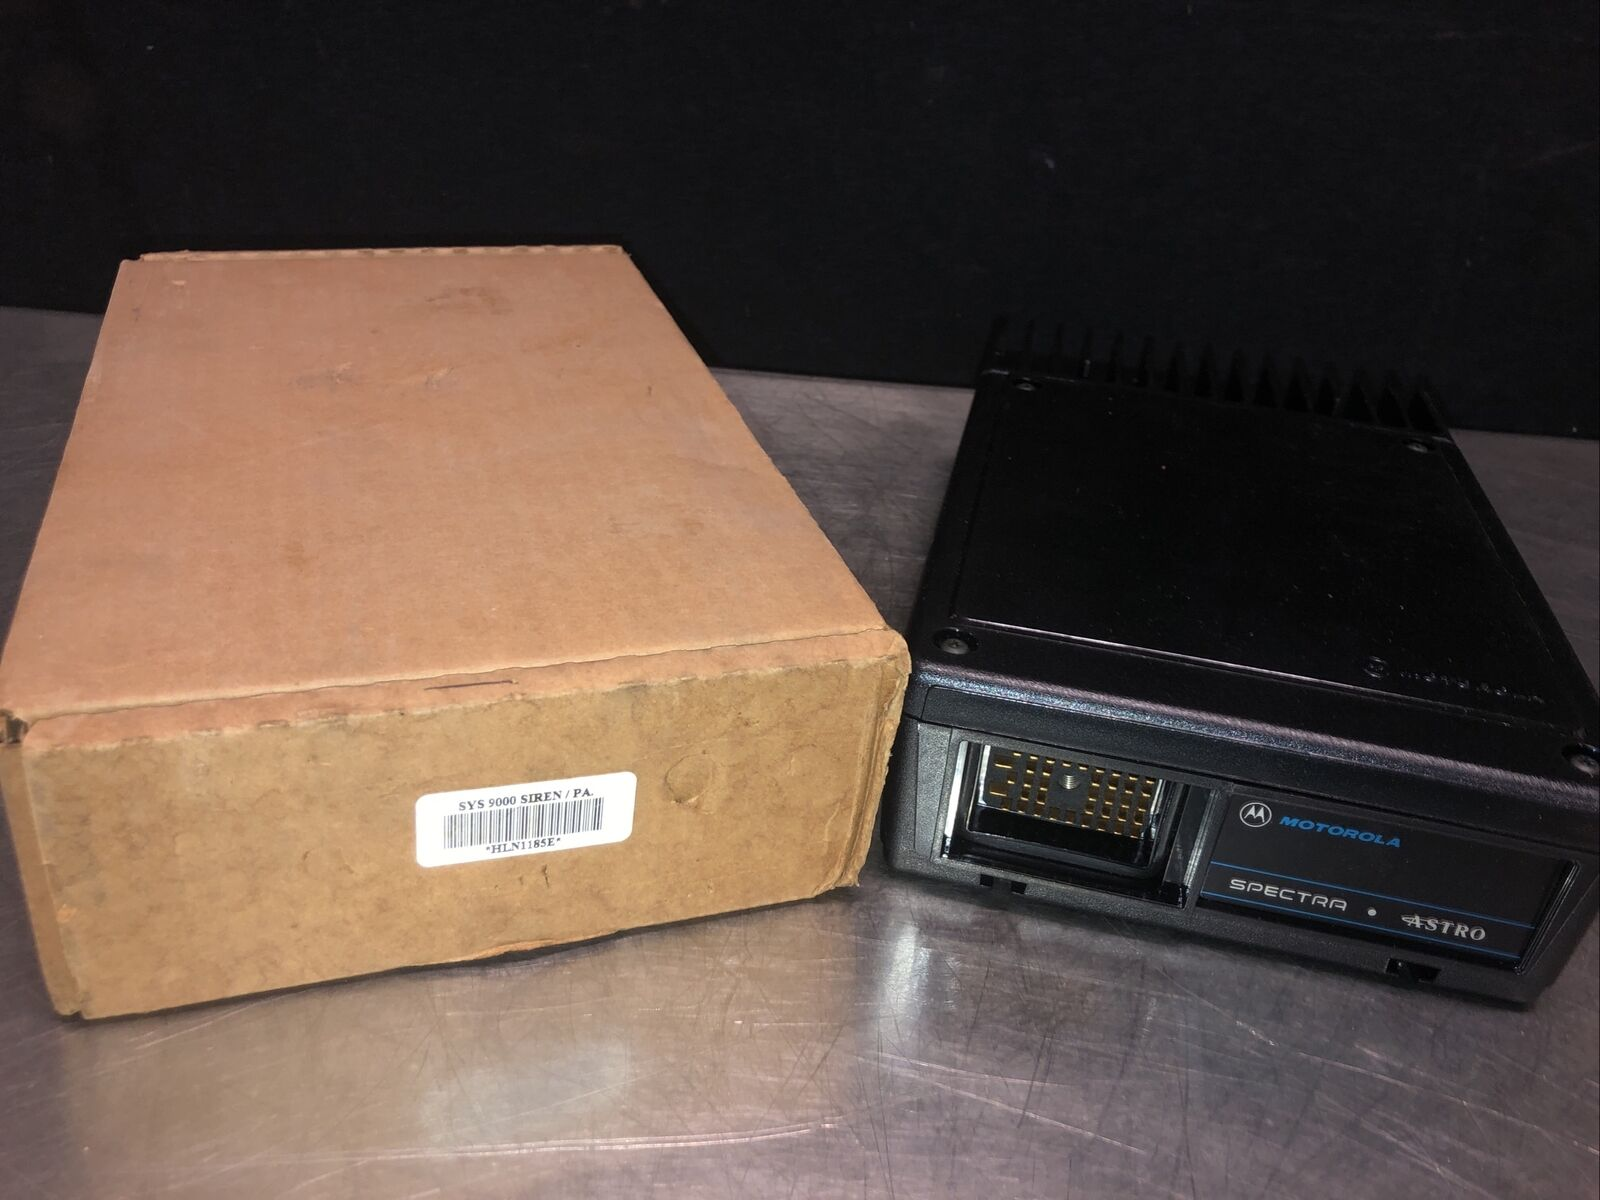 NOS Motorola Spectra Astro Systems 9000 HLN1185E Radio Siren/PA. Buy it now for 299.99